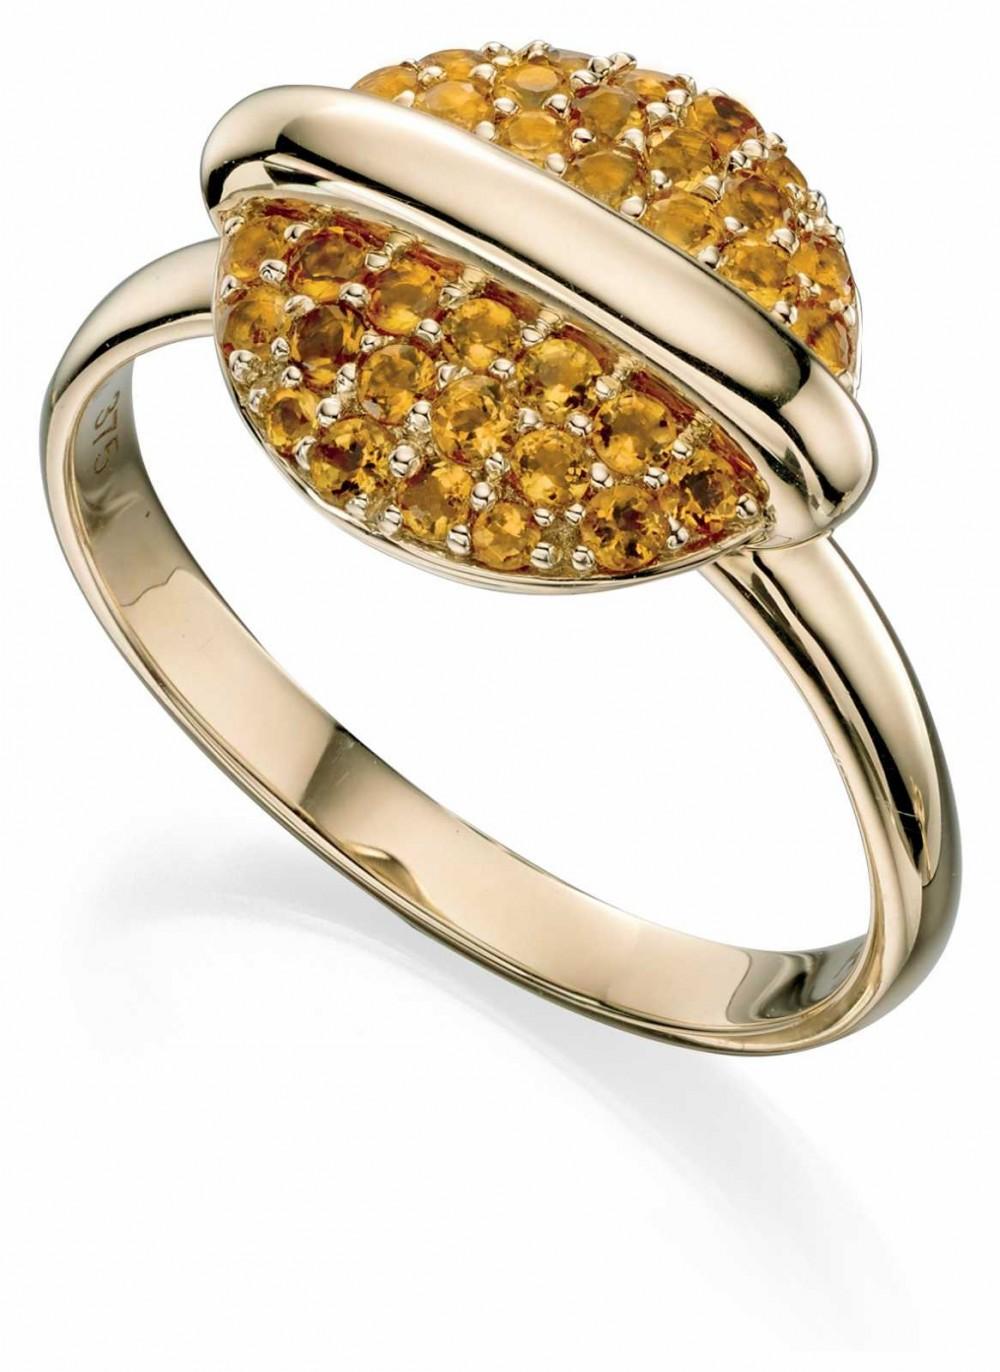 Fiorelli Gold Eclipse Ring 9k Gold Citrine Pavé Disc GR490